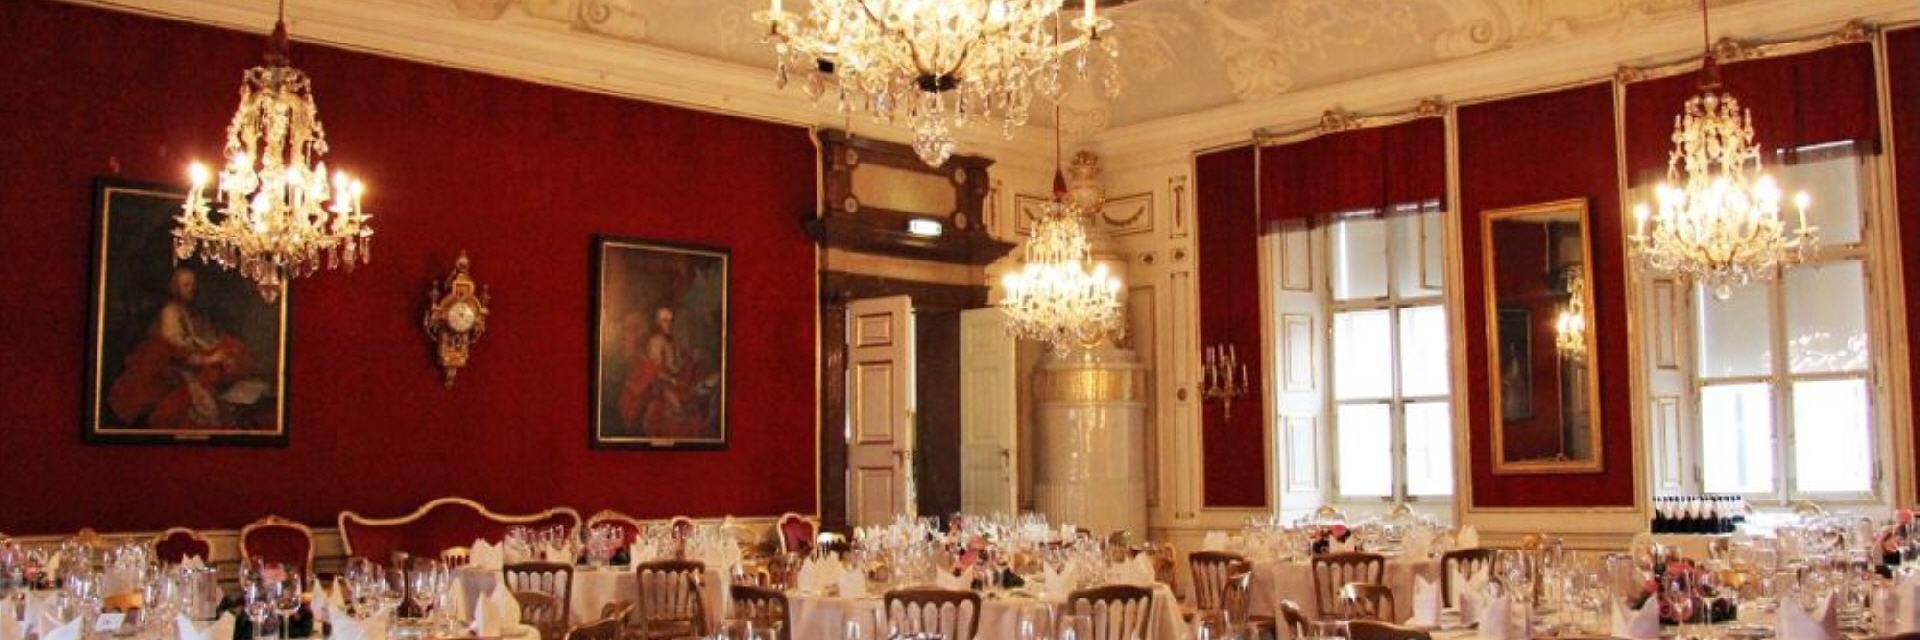 manuel wagner s catering salzburg rent a cook by m w. Black Bedroom Furniture Sets. Home Design Ideas